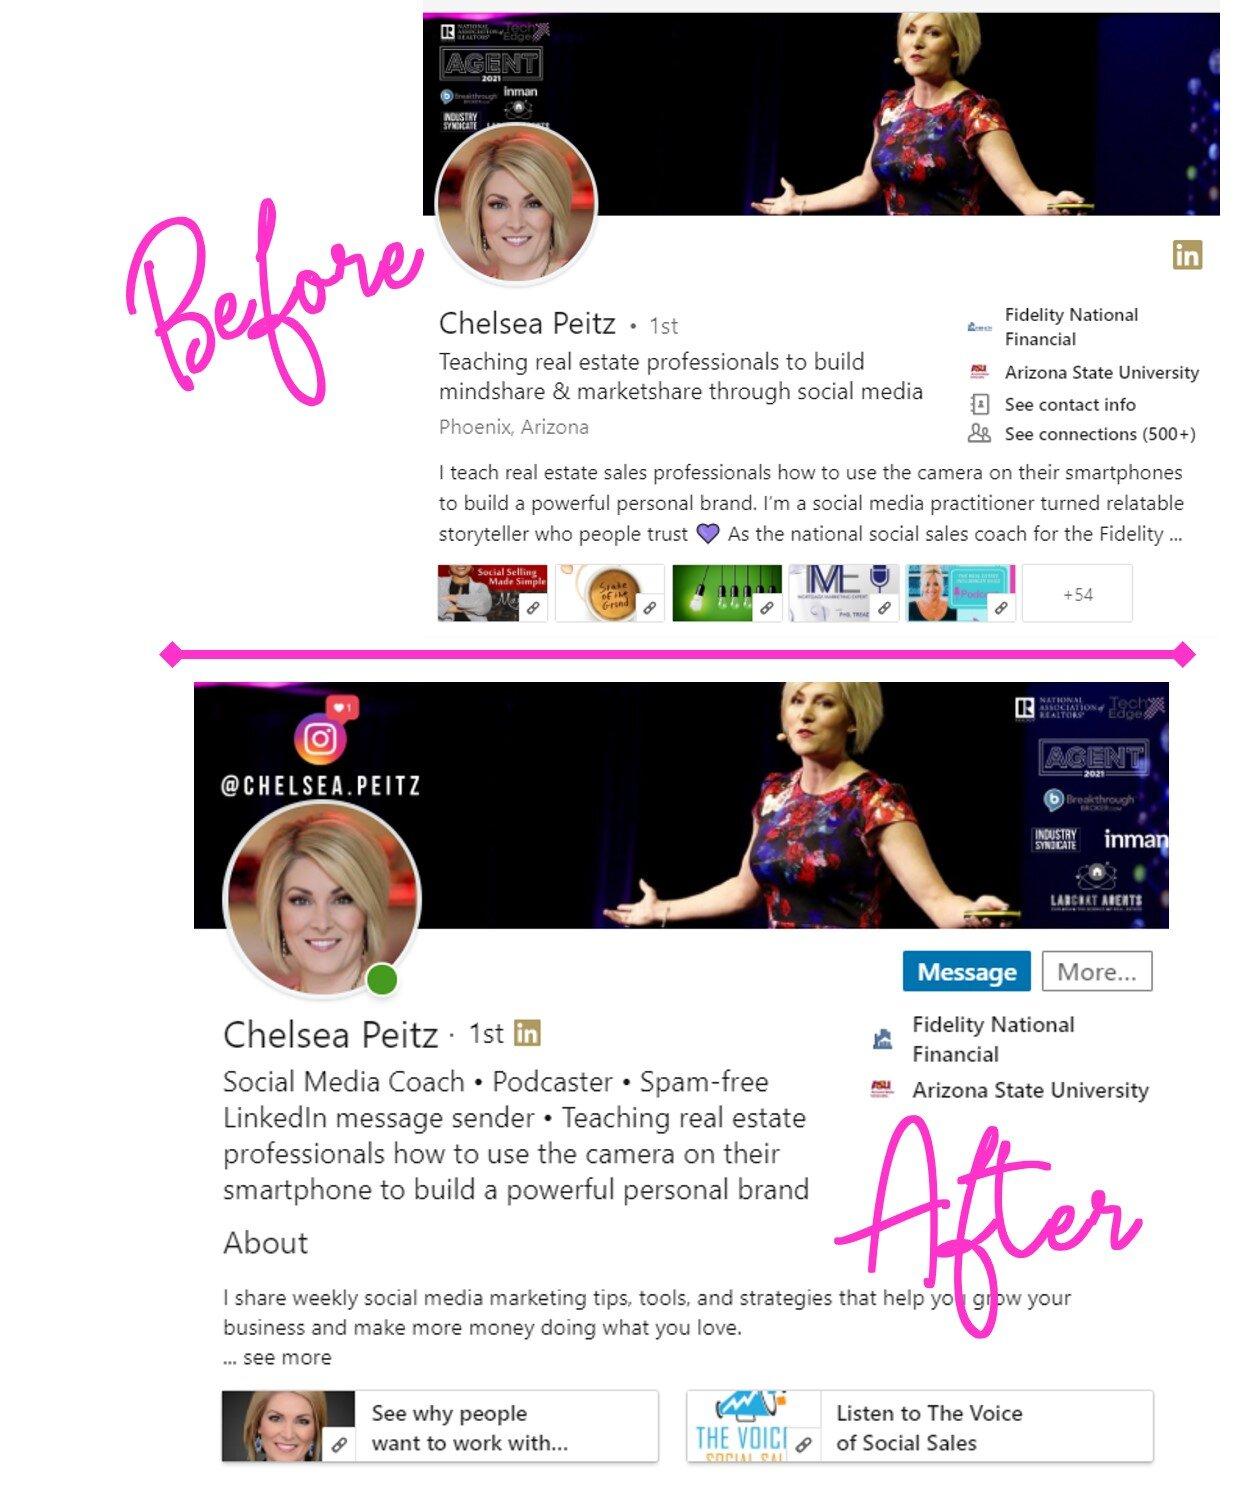 Chelsea Peitz LinkedIn Judi Fox LinkedIn Business Accelerator The Voice of Social Sales Podcast.jpg